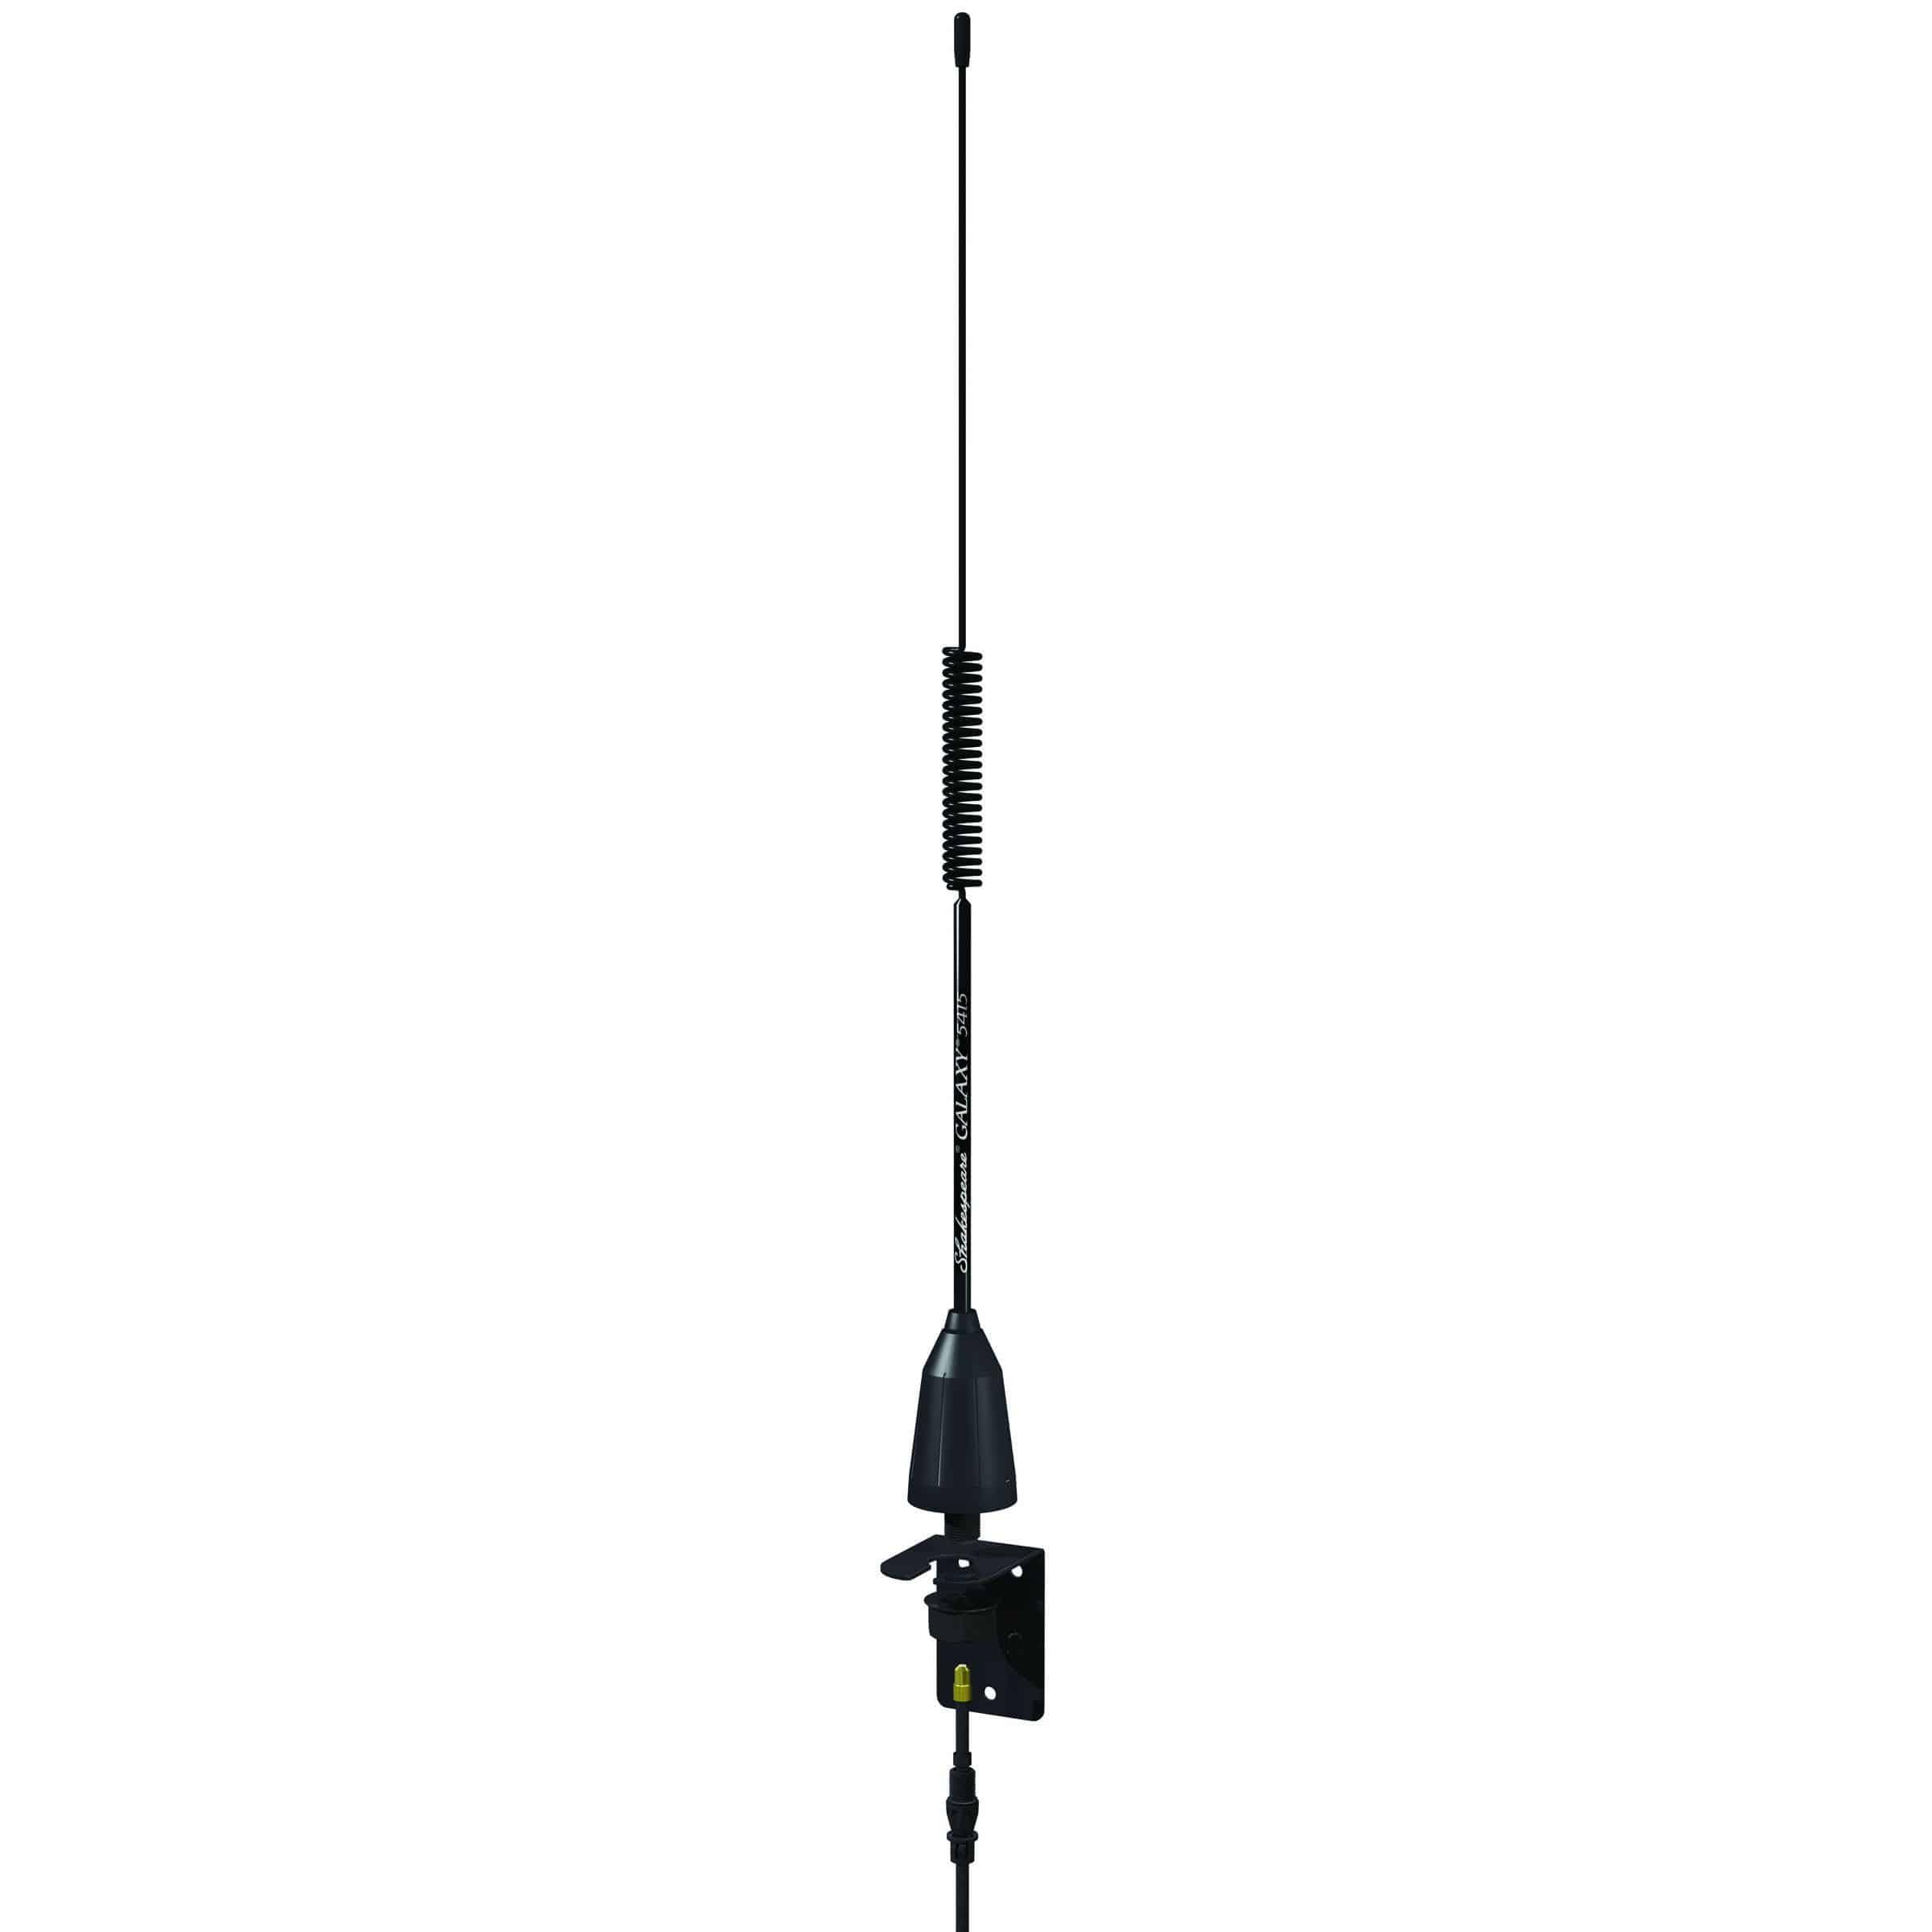 5415 - Shakespeare 2' Vhf Antenna 3Db Gain Low Profile 1/2 Wave